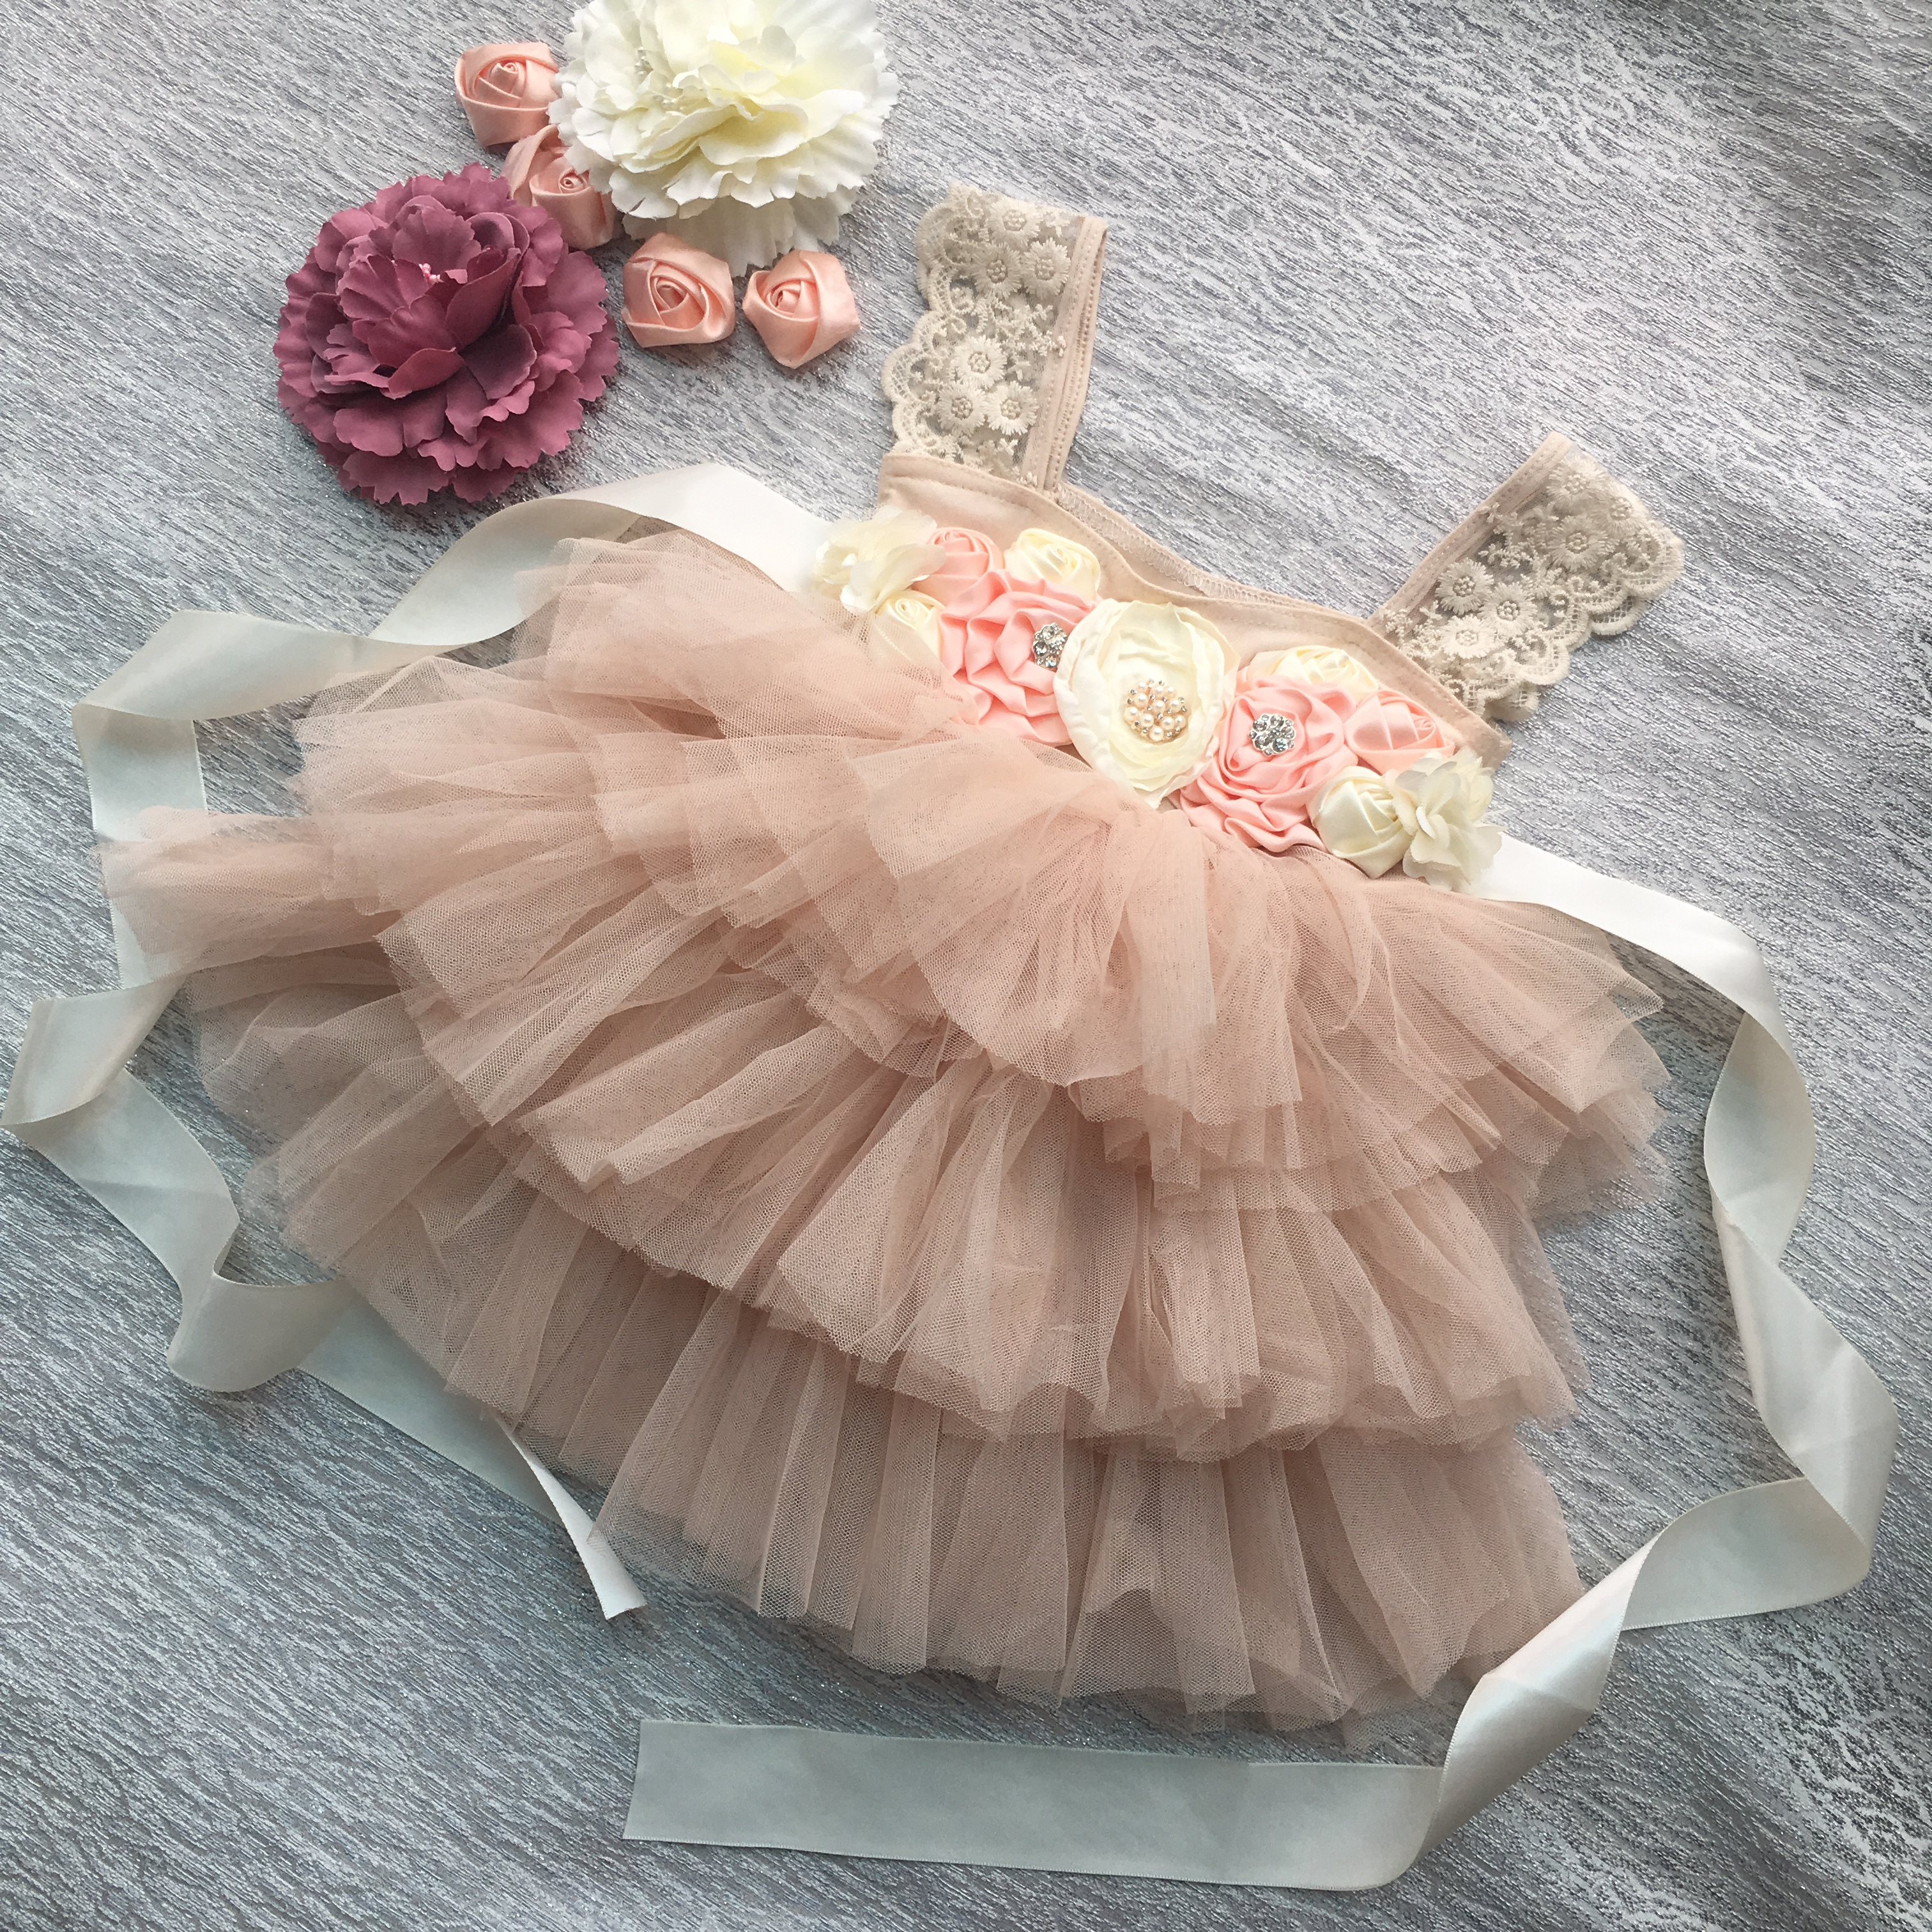 Retail Gorgeous Rhinestone Sashes Girl Evening Dress Baby Girl Lace Sling Princess Tutu Dress Kids Formal Costume 2